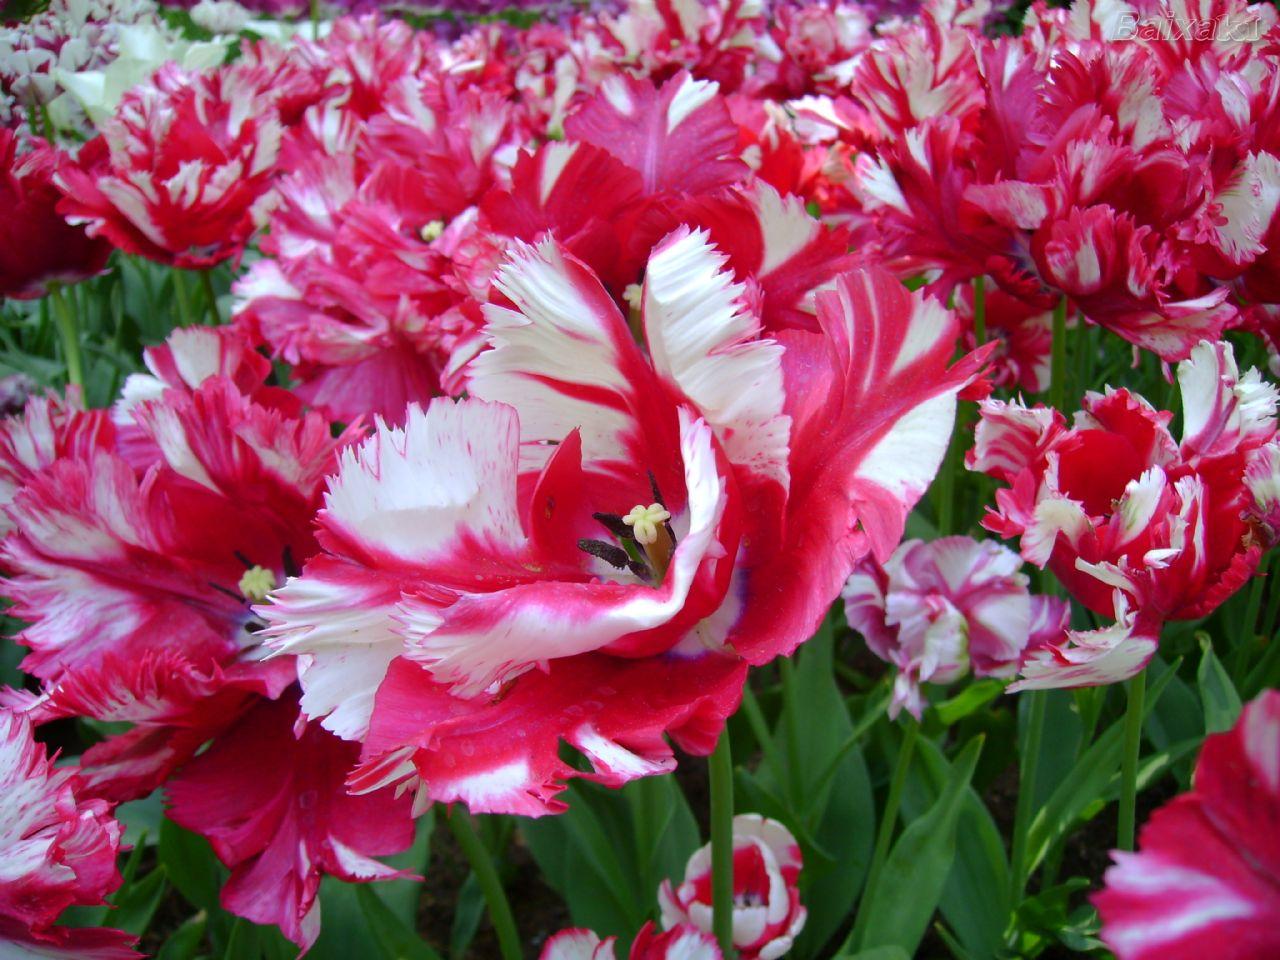 flores no jardim de deus : flores no jardim de deus: compartilhar no twitter compartilhar no facebook compartilhar com